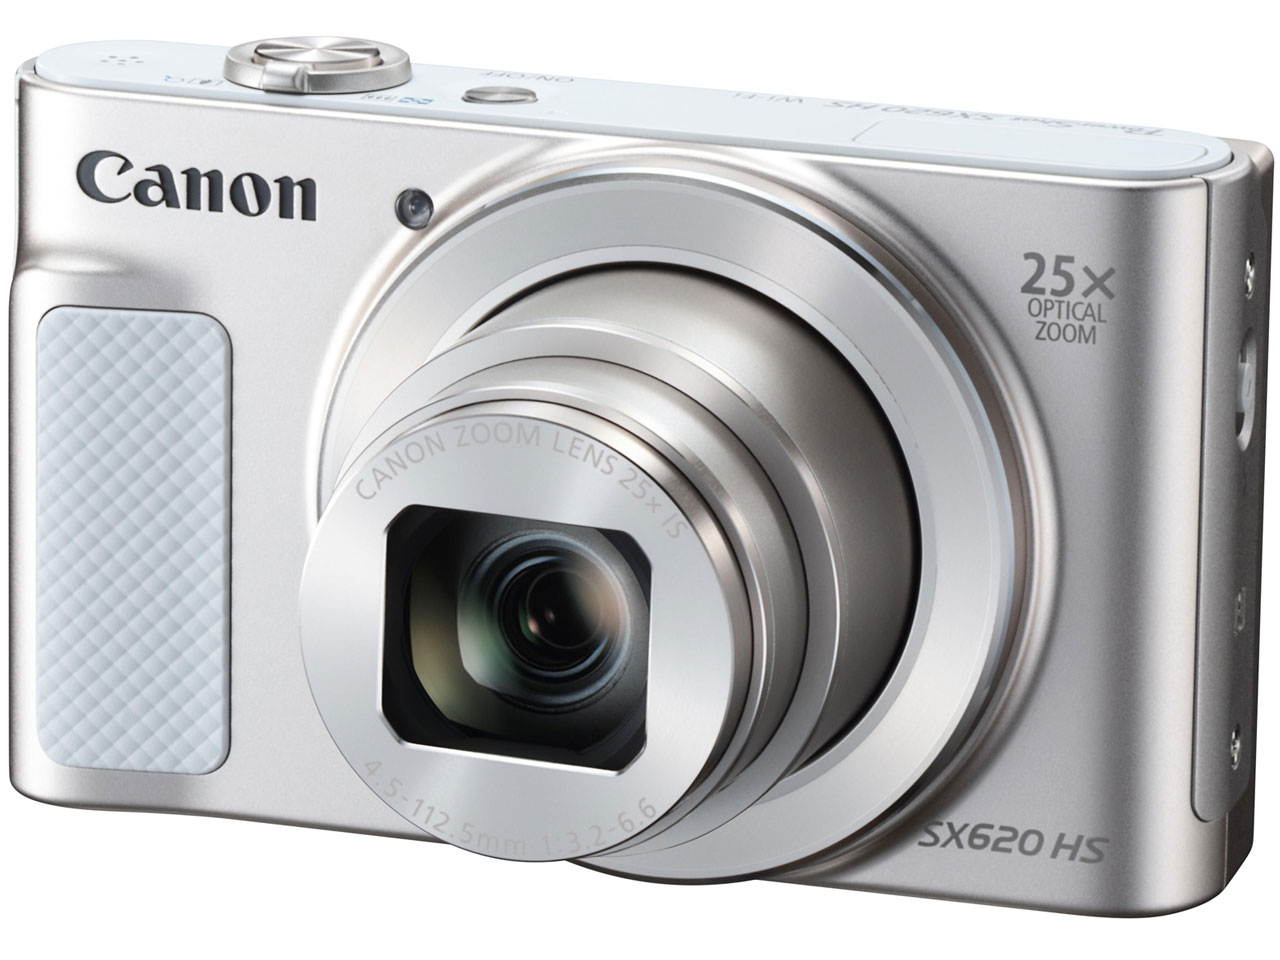 PowerShot SX620 HS [ホワイト] の製品画像